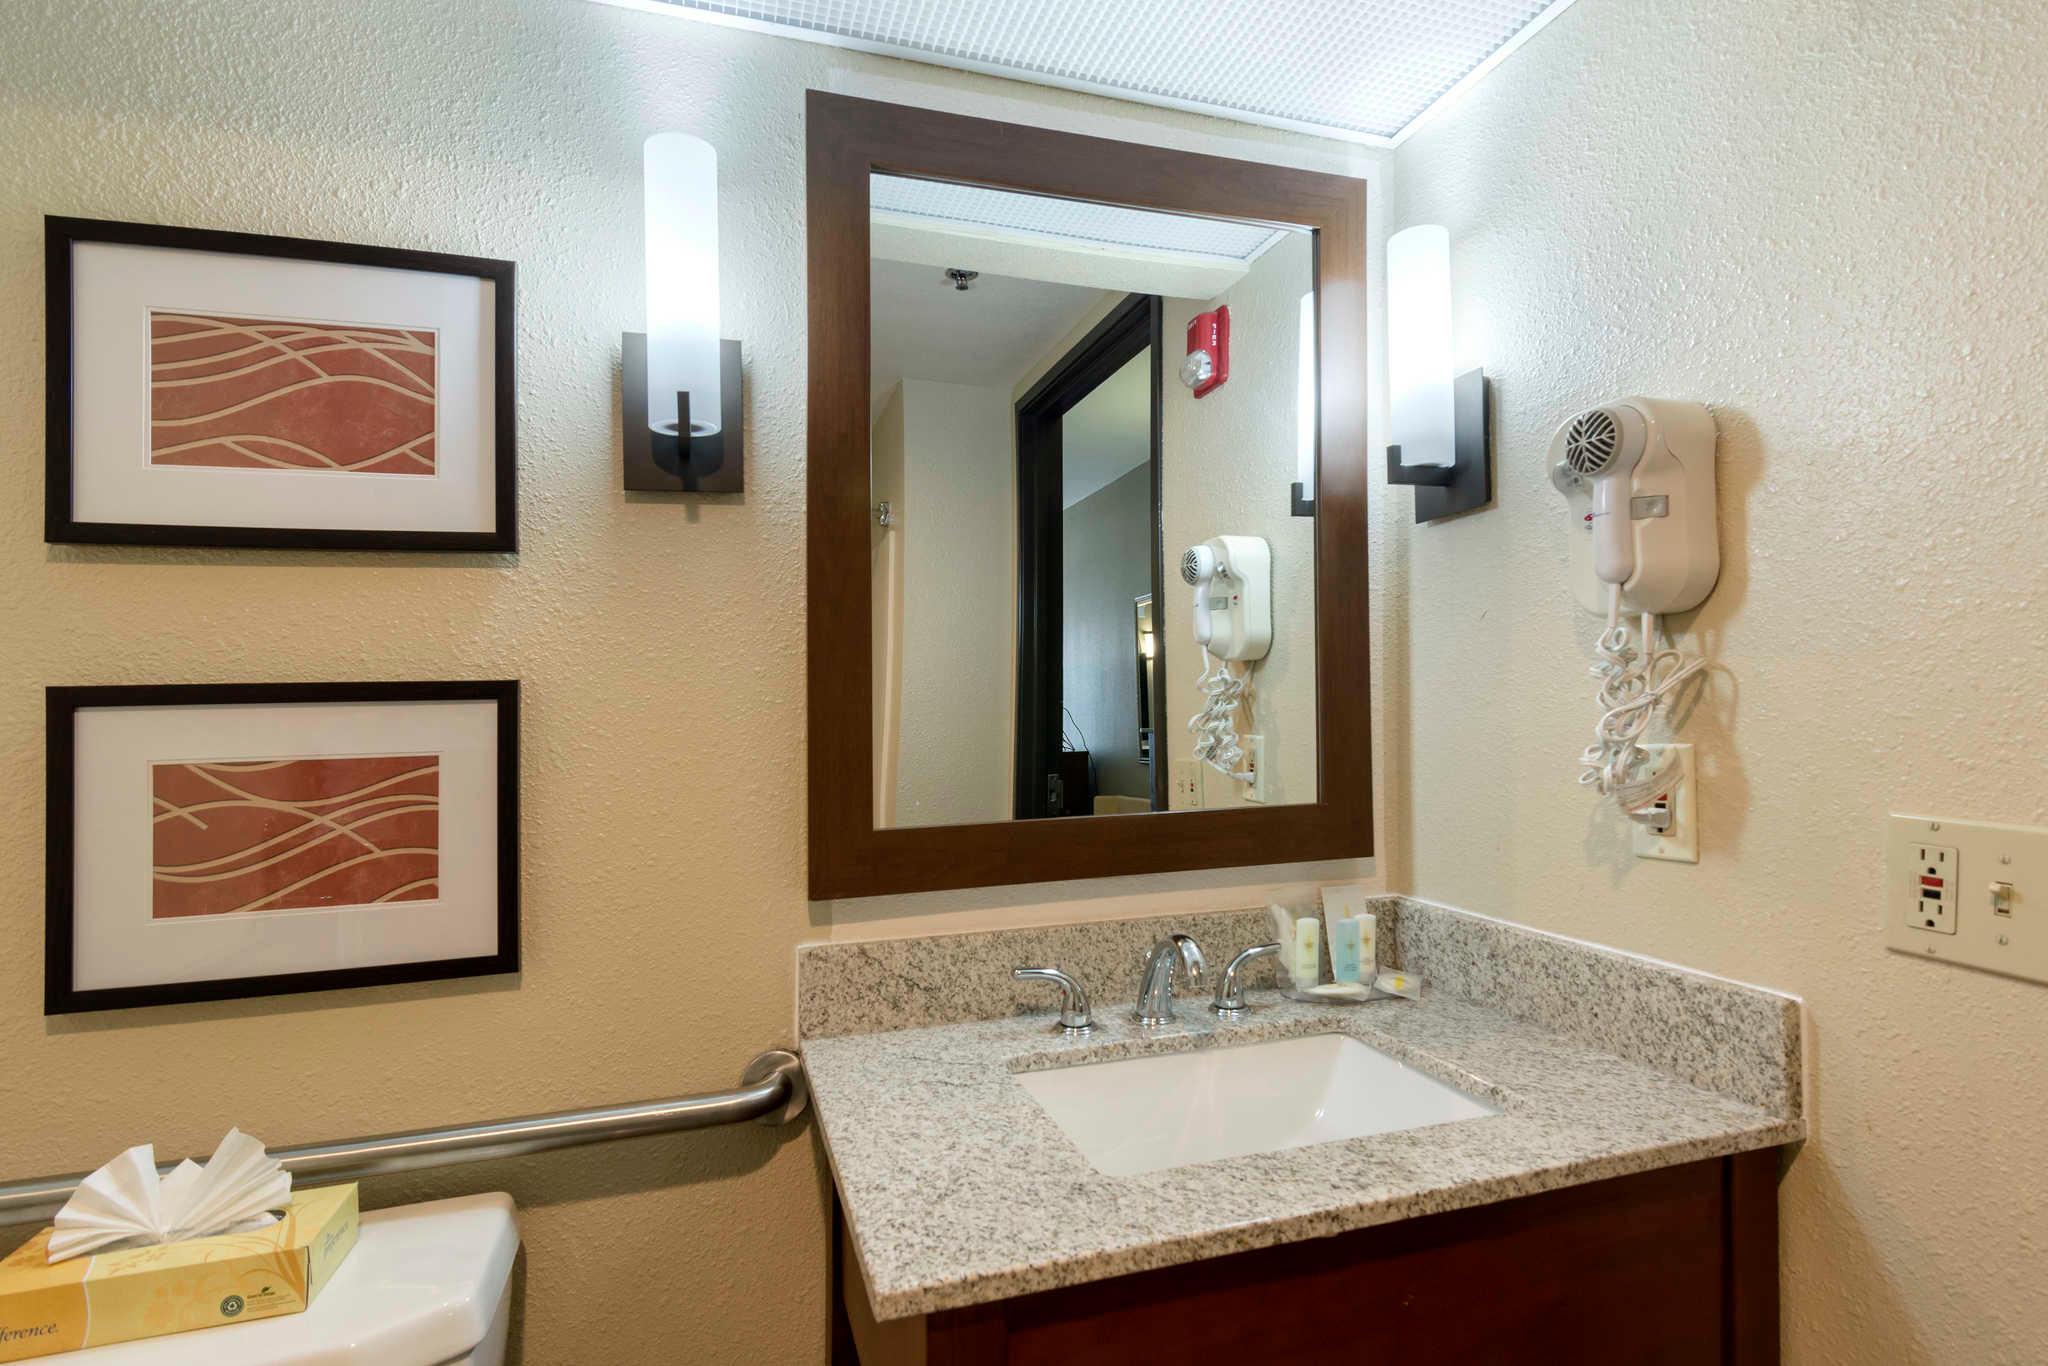 Comfort Inn & Suites Sacramento - University Area image 19